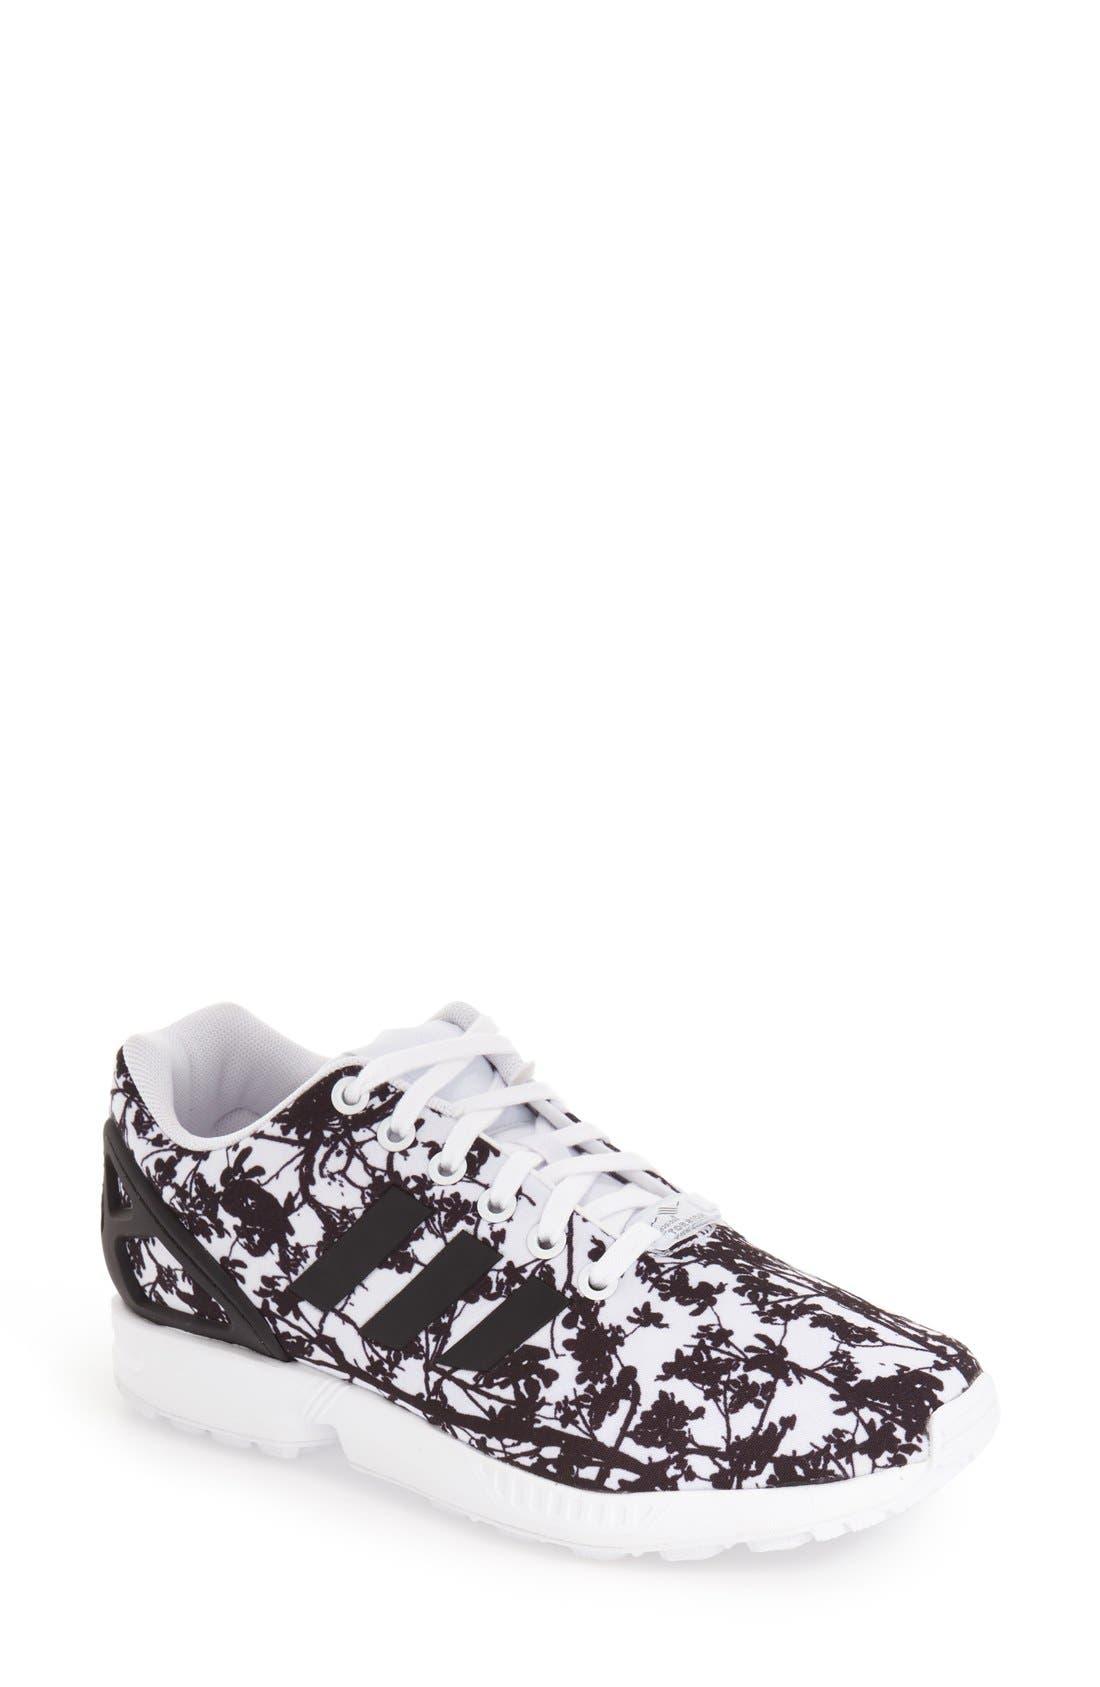 Alternate Image 1 Selected - adidas 'ZX Flux' Sneaker (Women)